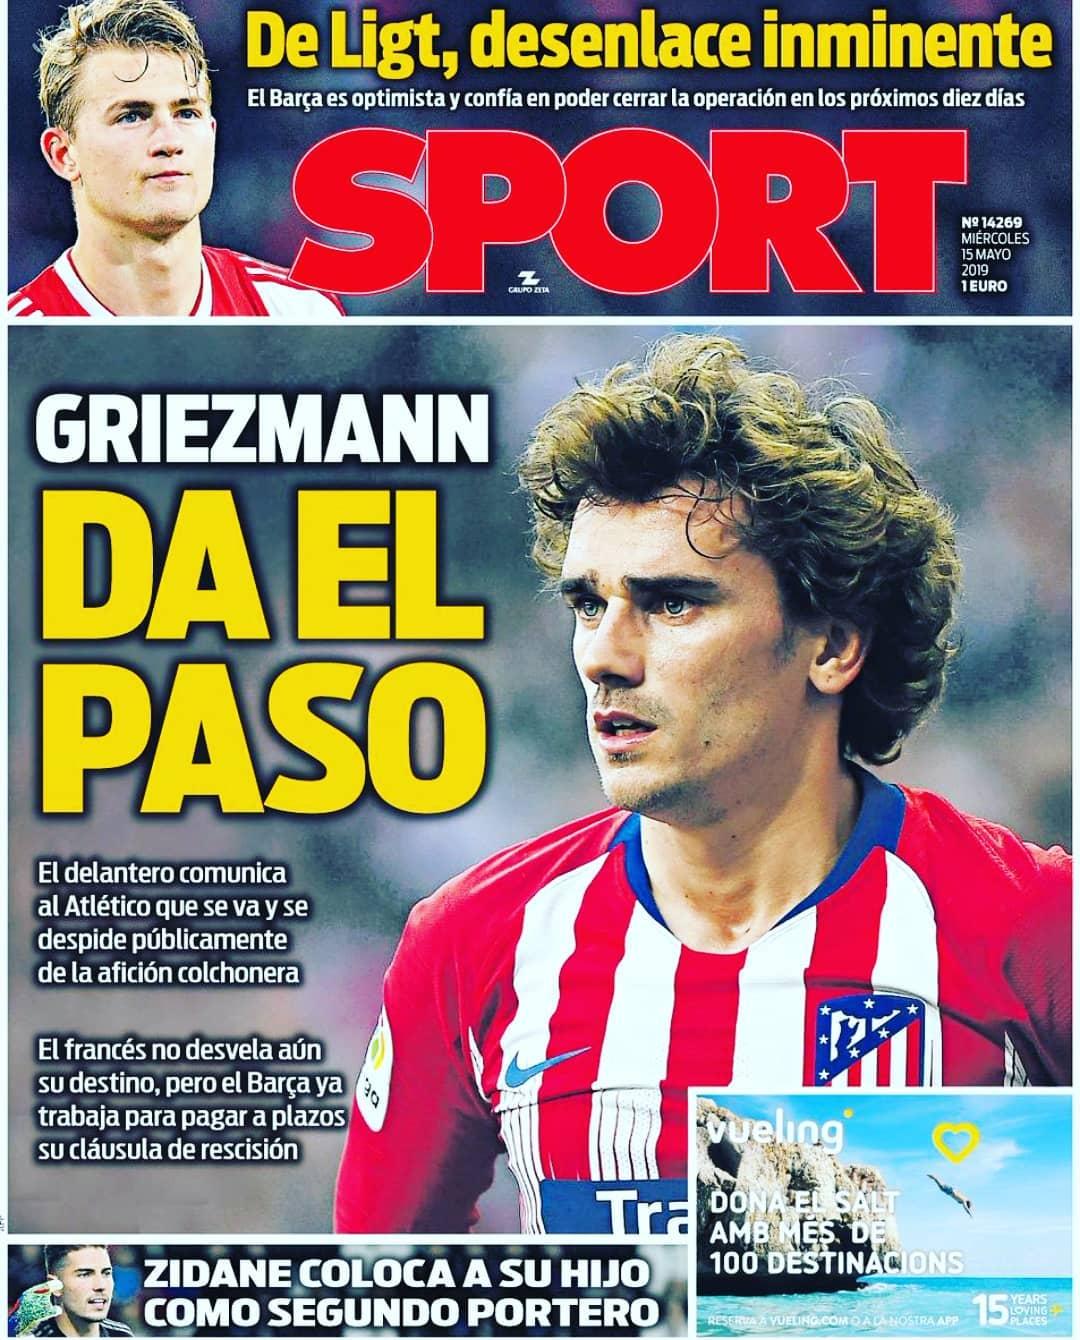 Portada @diariosport #championsleague #instagood #sports #pasion #messi #serieA …